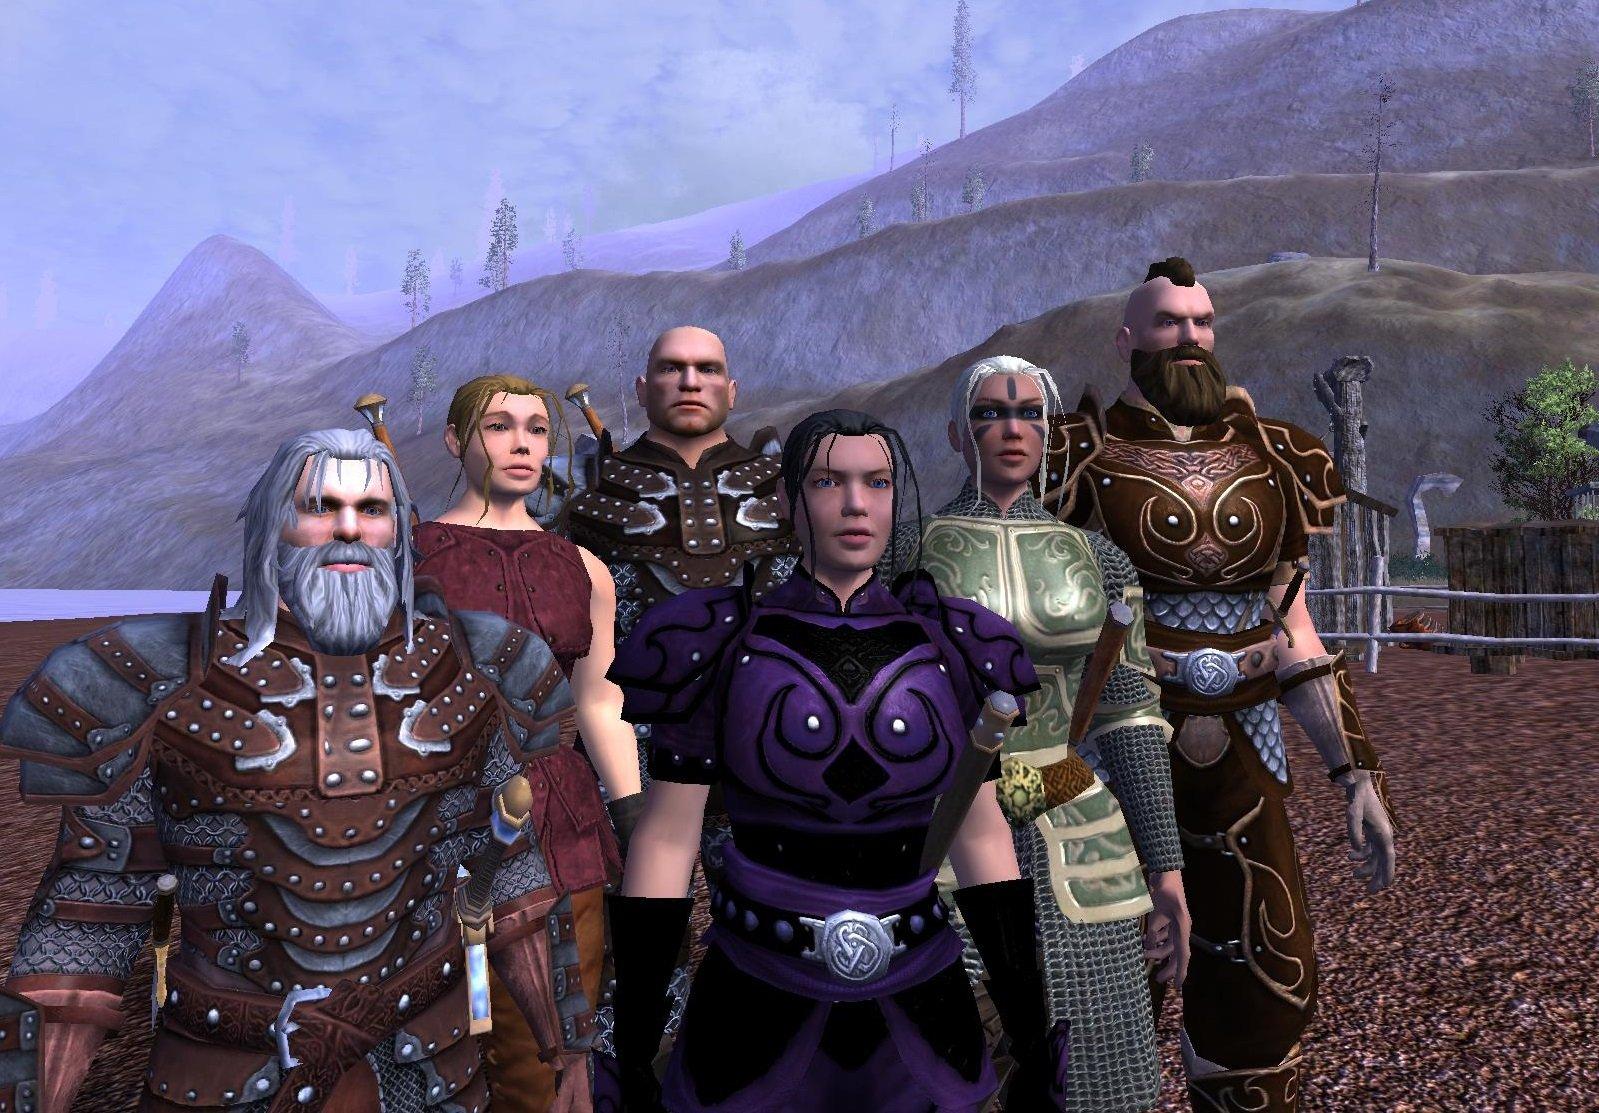 pantheon: rise of the fallen EverQuest vanguard